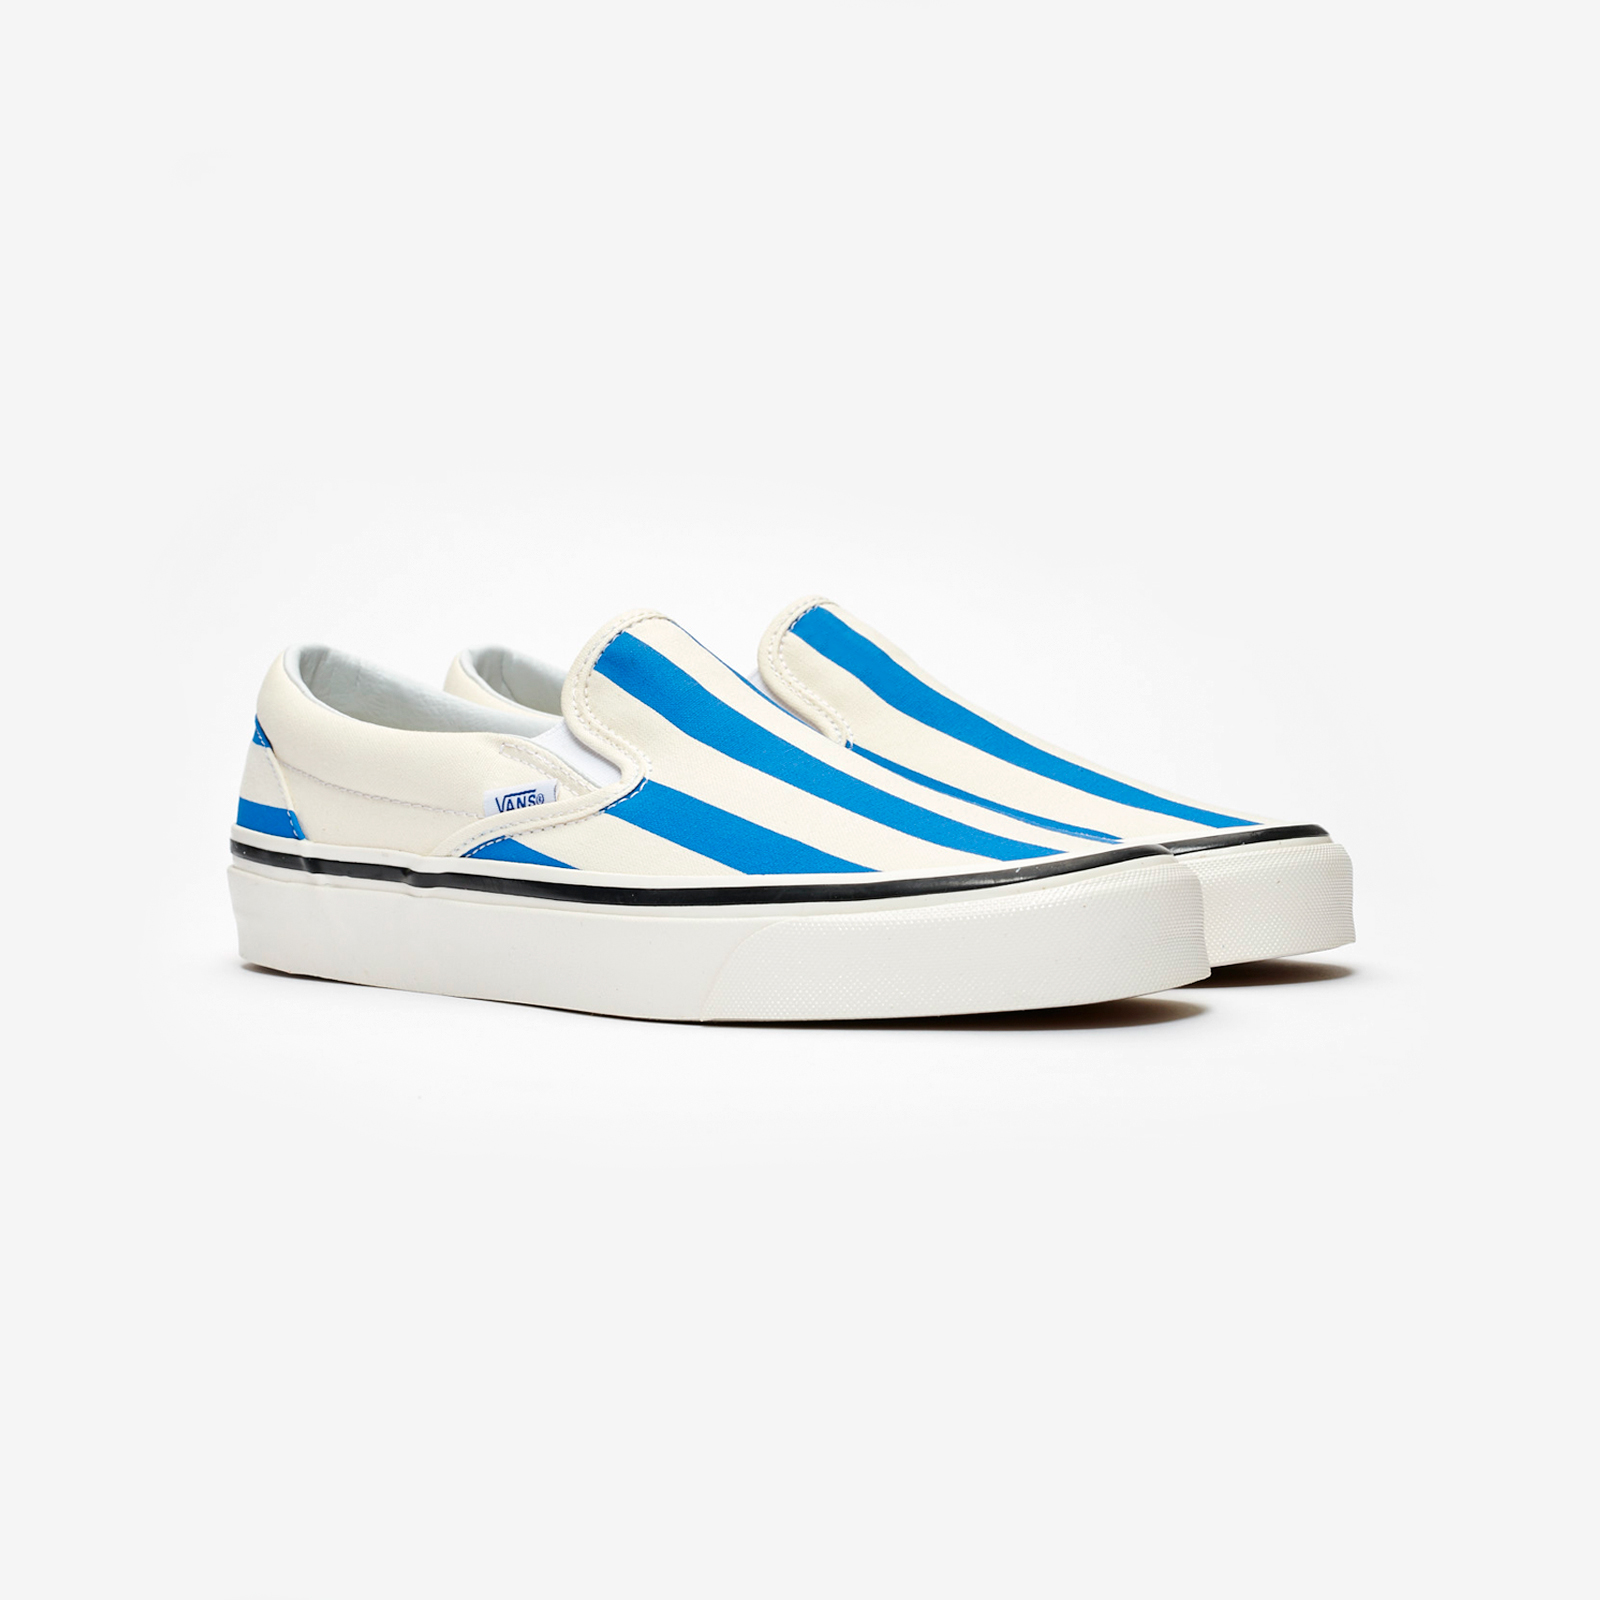 c263ddb16abc Vans Classic Slip-On 98 DX - Va3jexvn0 - Sneakersnstuff | sneakers ...